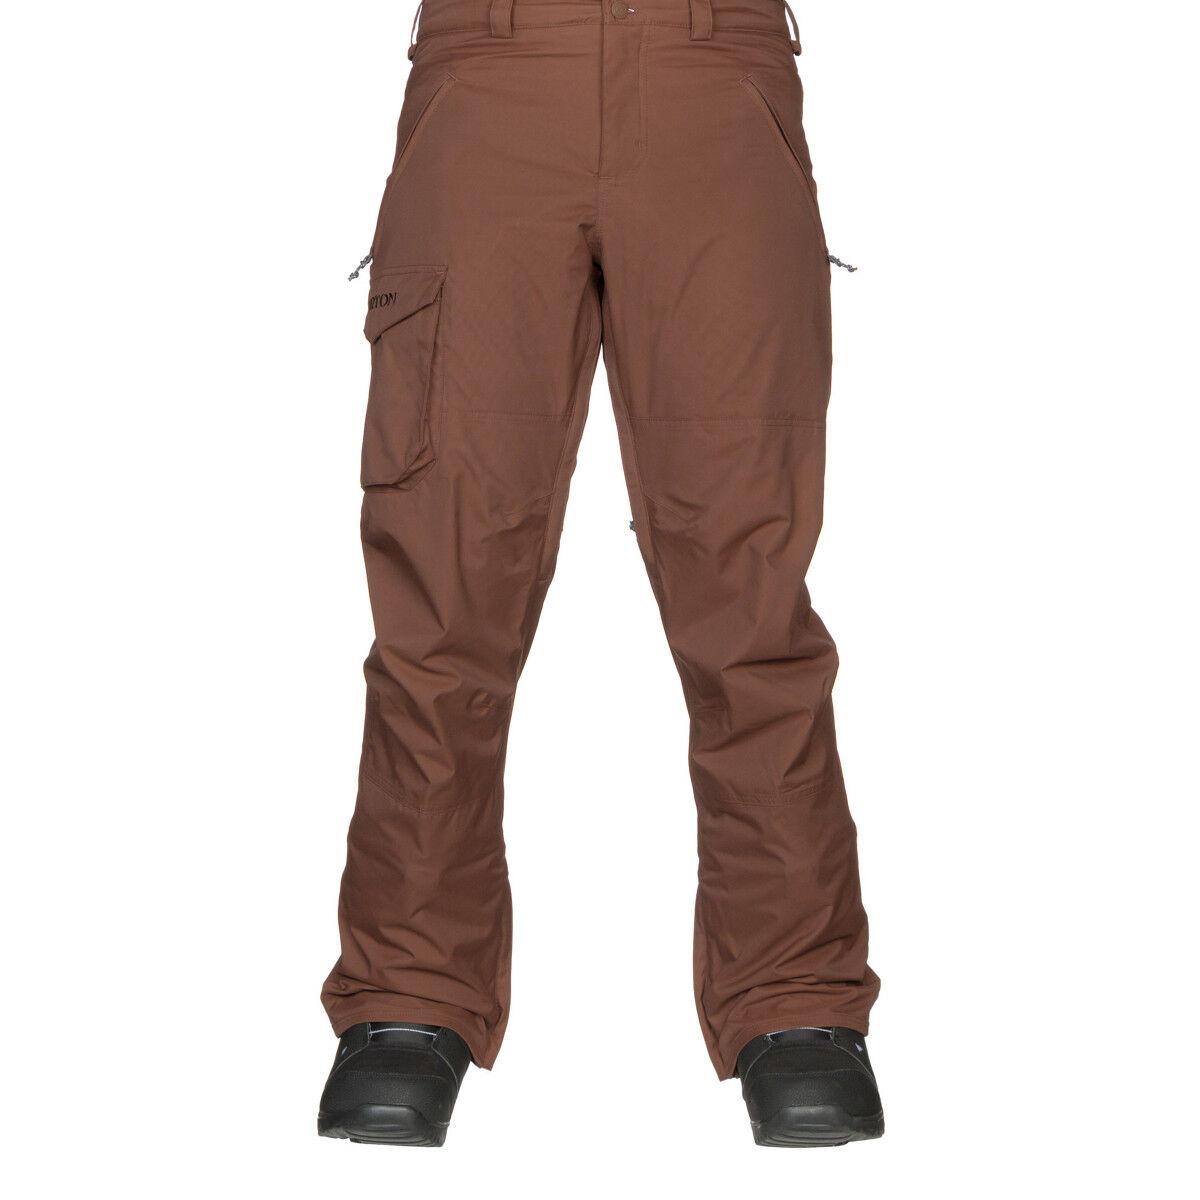 NEW Men's Burton Chestnut COgreen Pant Regular Fit snowboard snow Size Large L XL